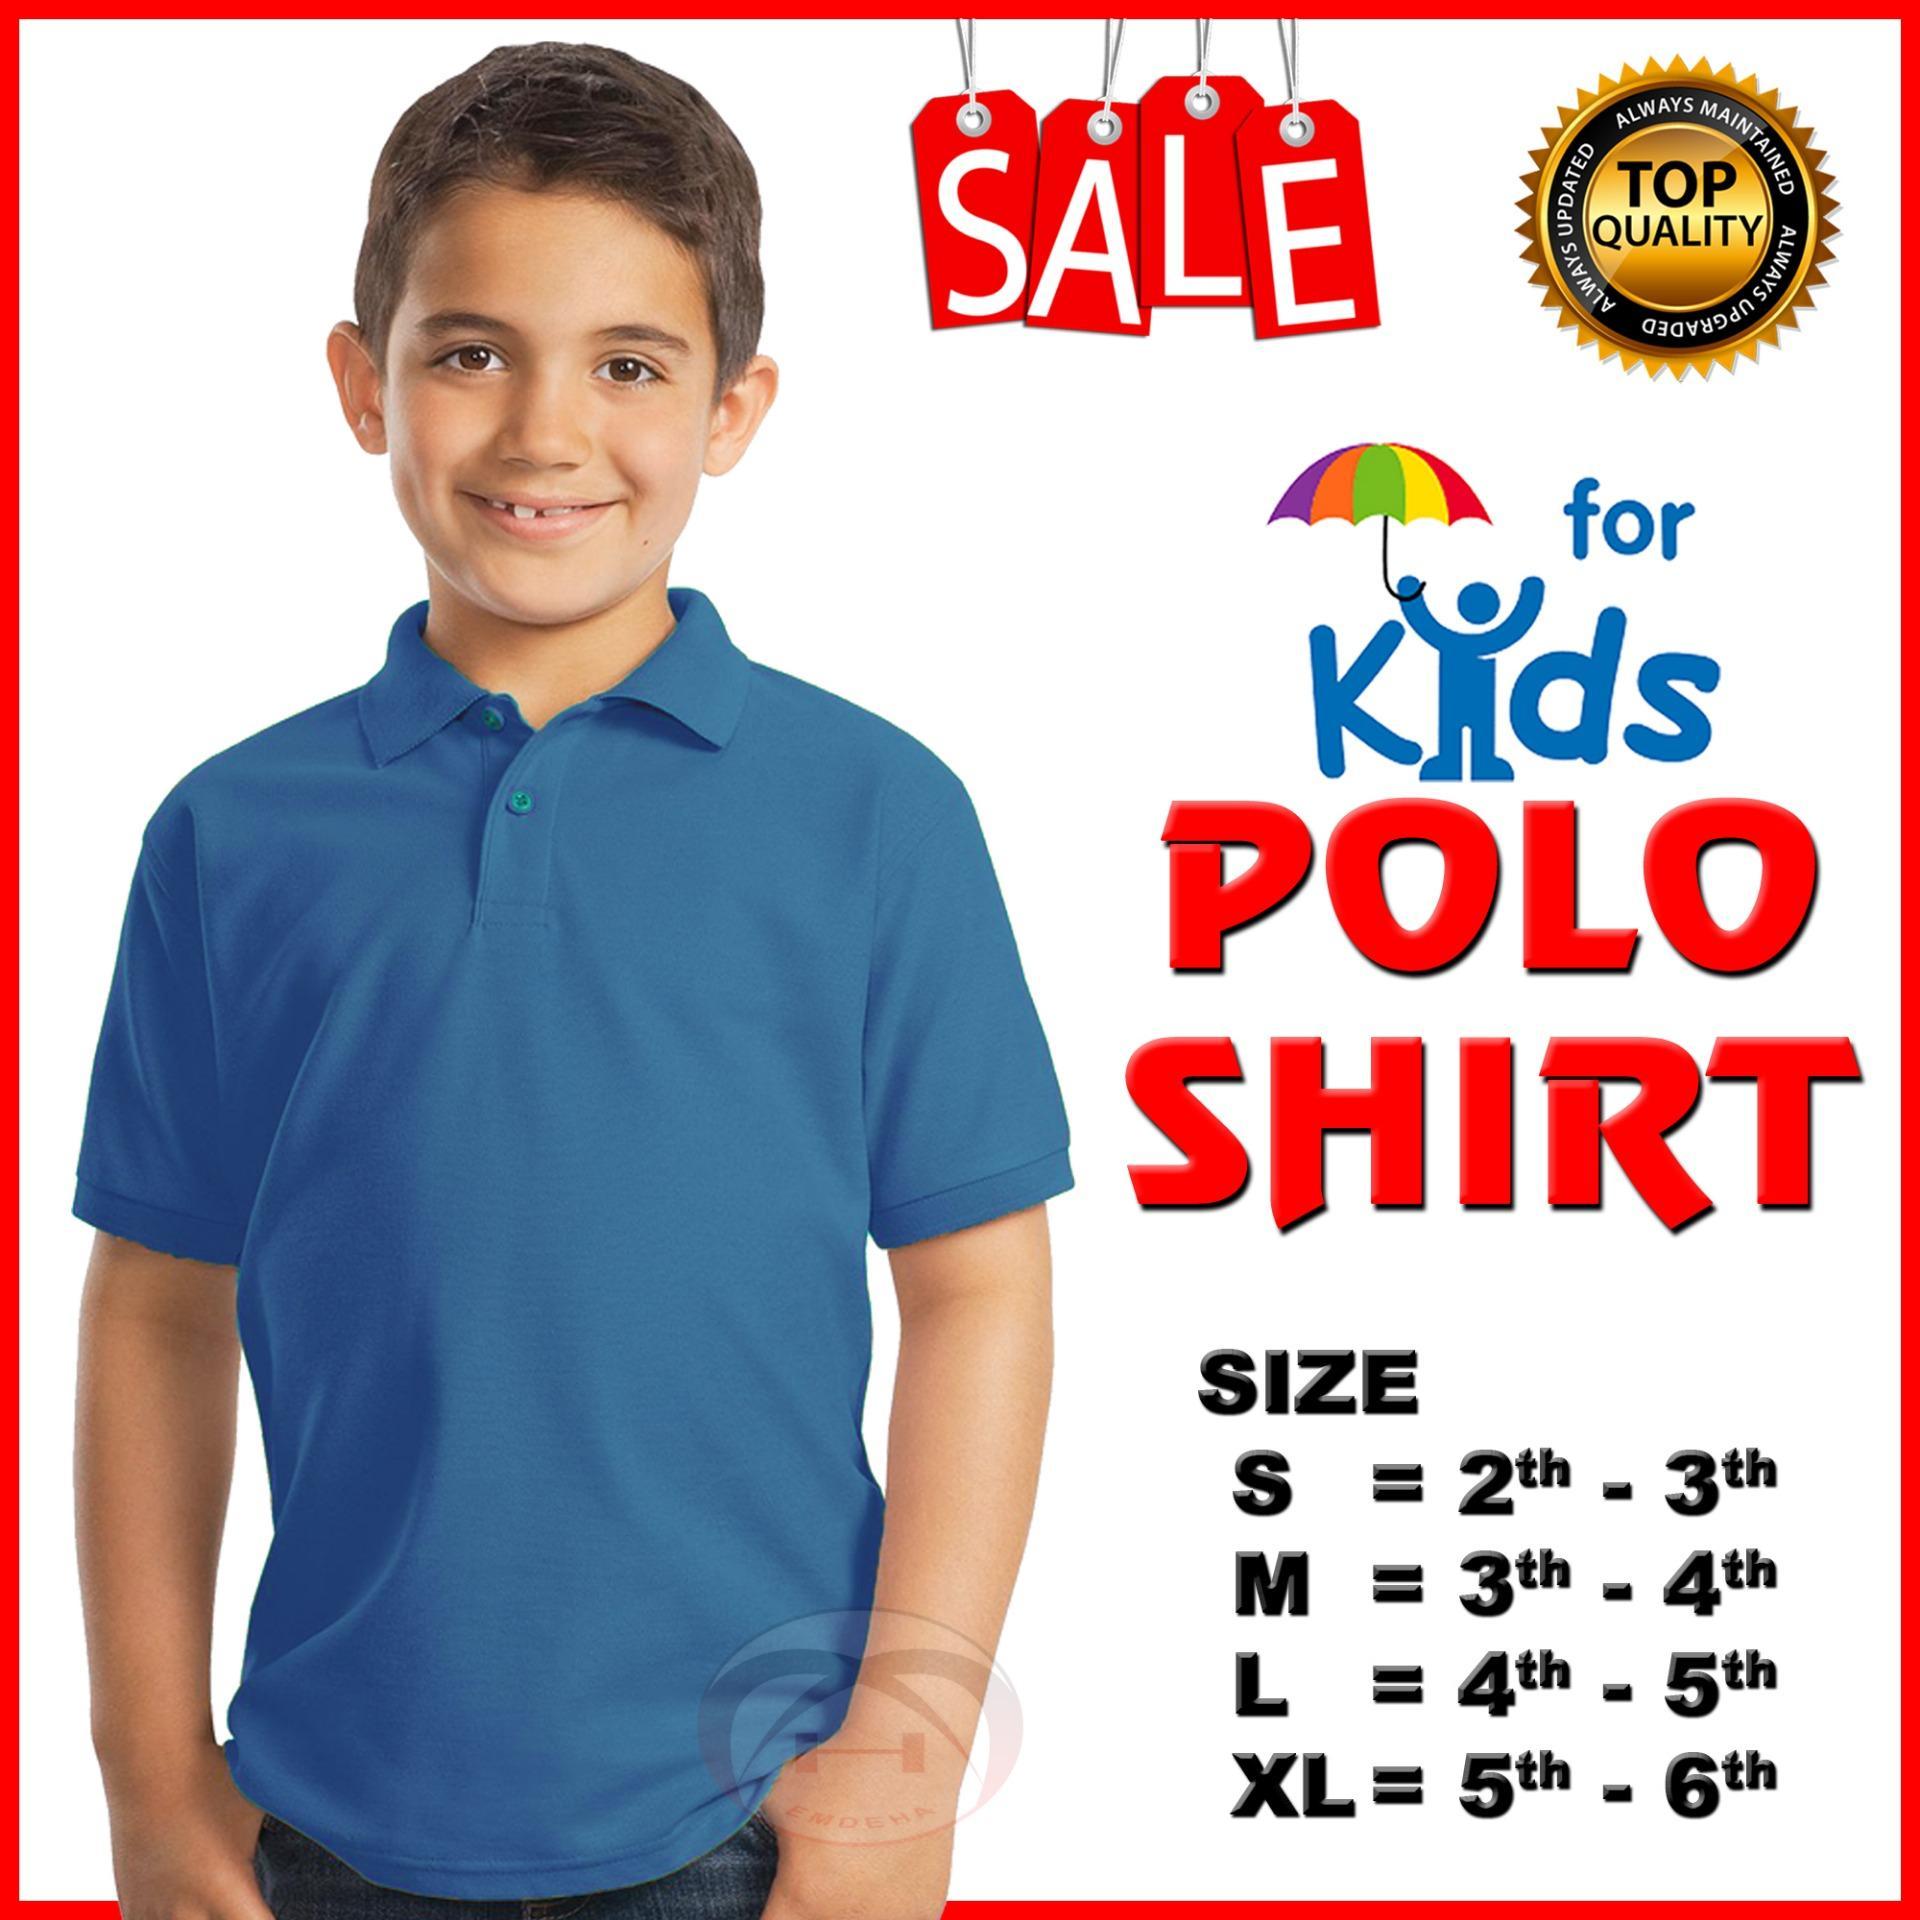 Emdeha Store - Kaos Kerah Polo Shirt Anak-Anak Polos Cotton Pique Usia 2 hingga 6 tahun